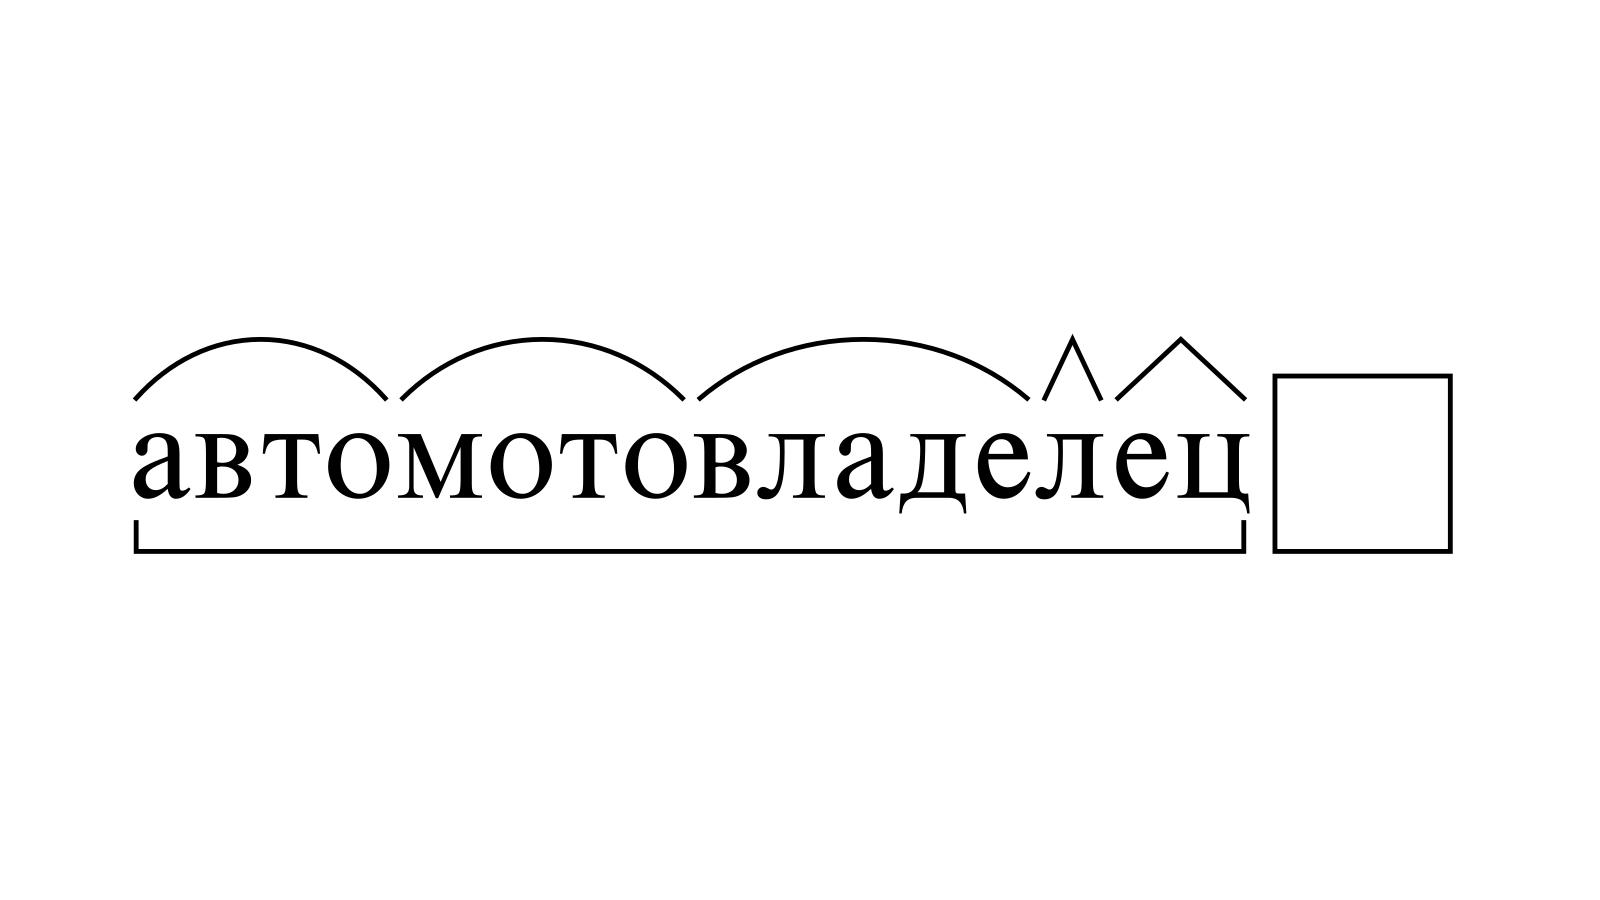 Разбор слова «автомотовладелец» по составу